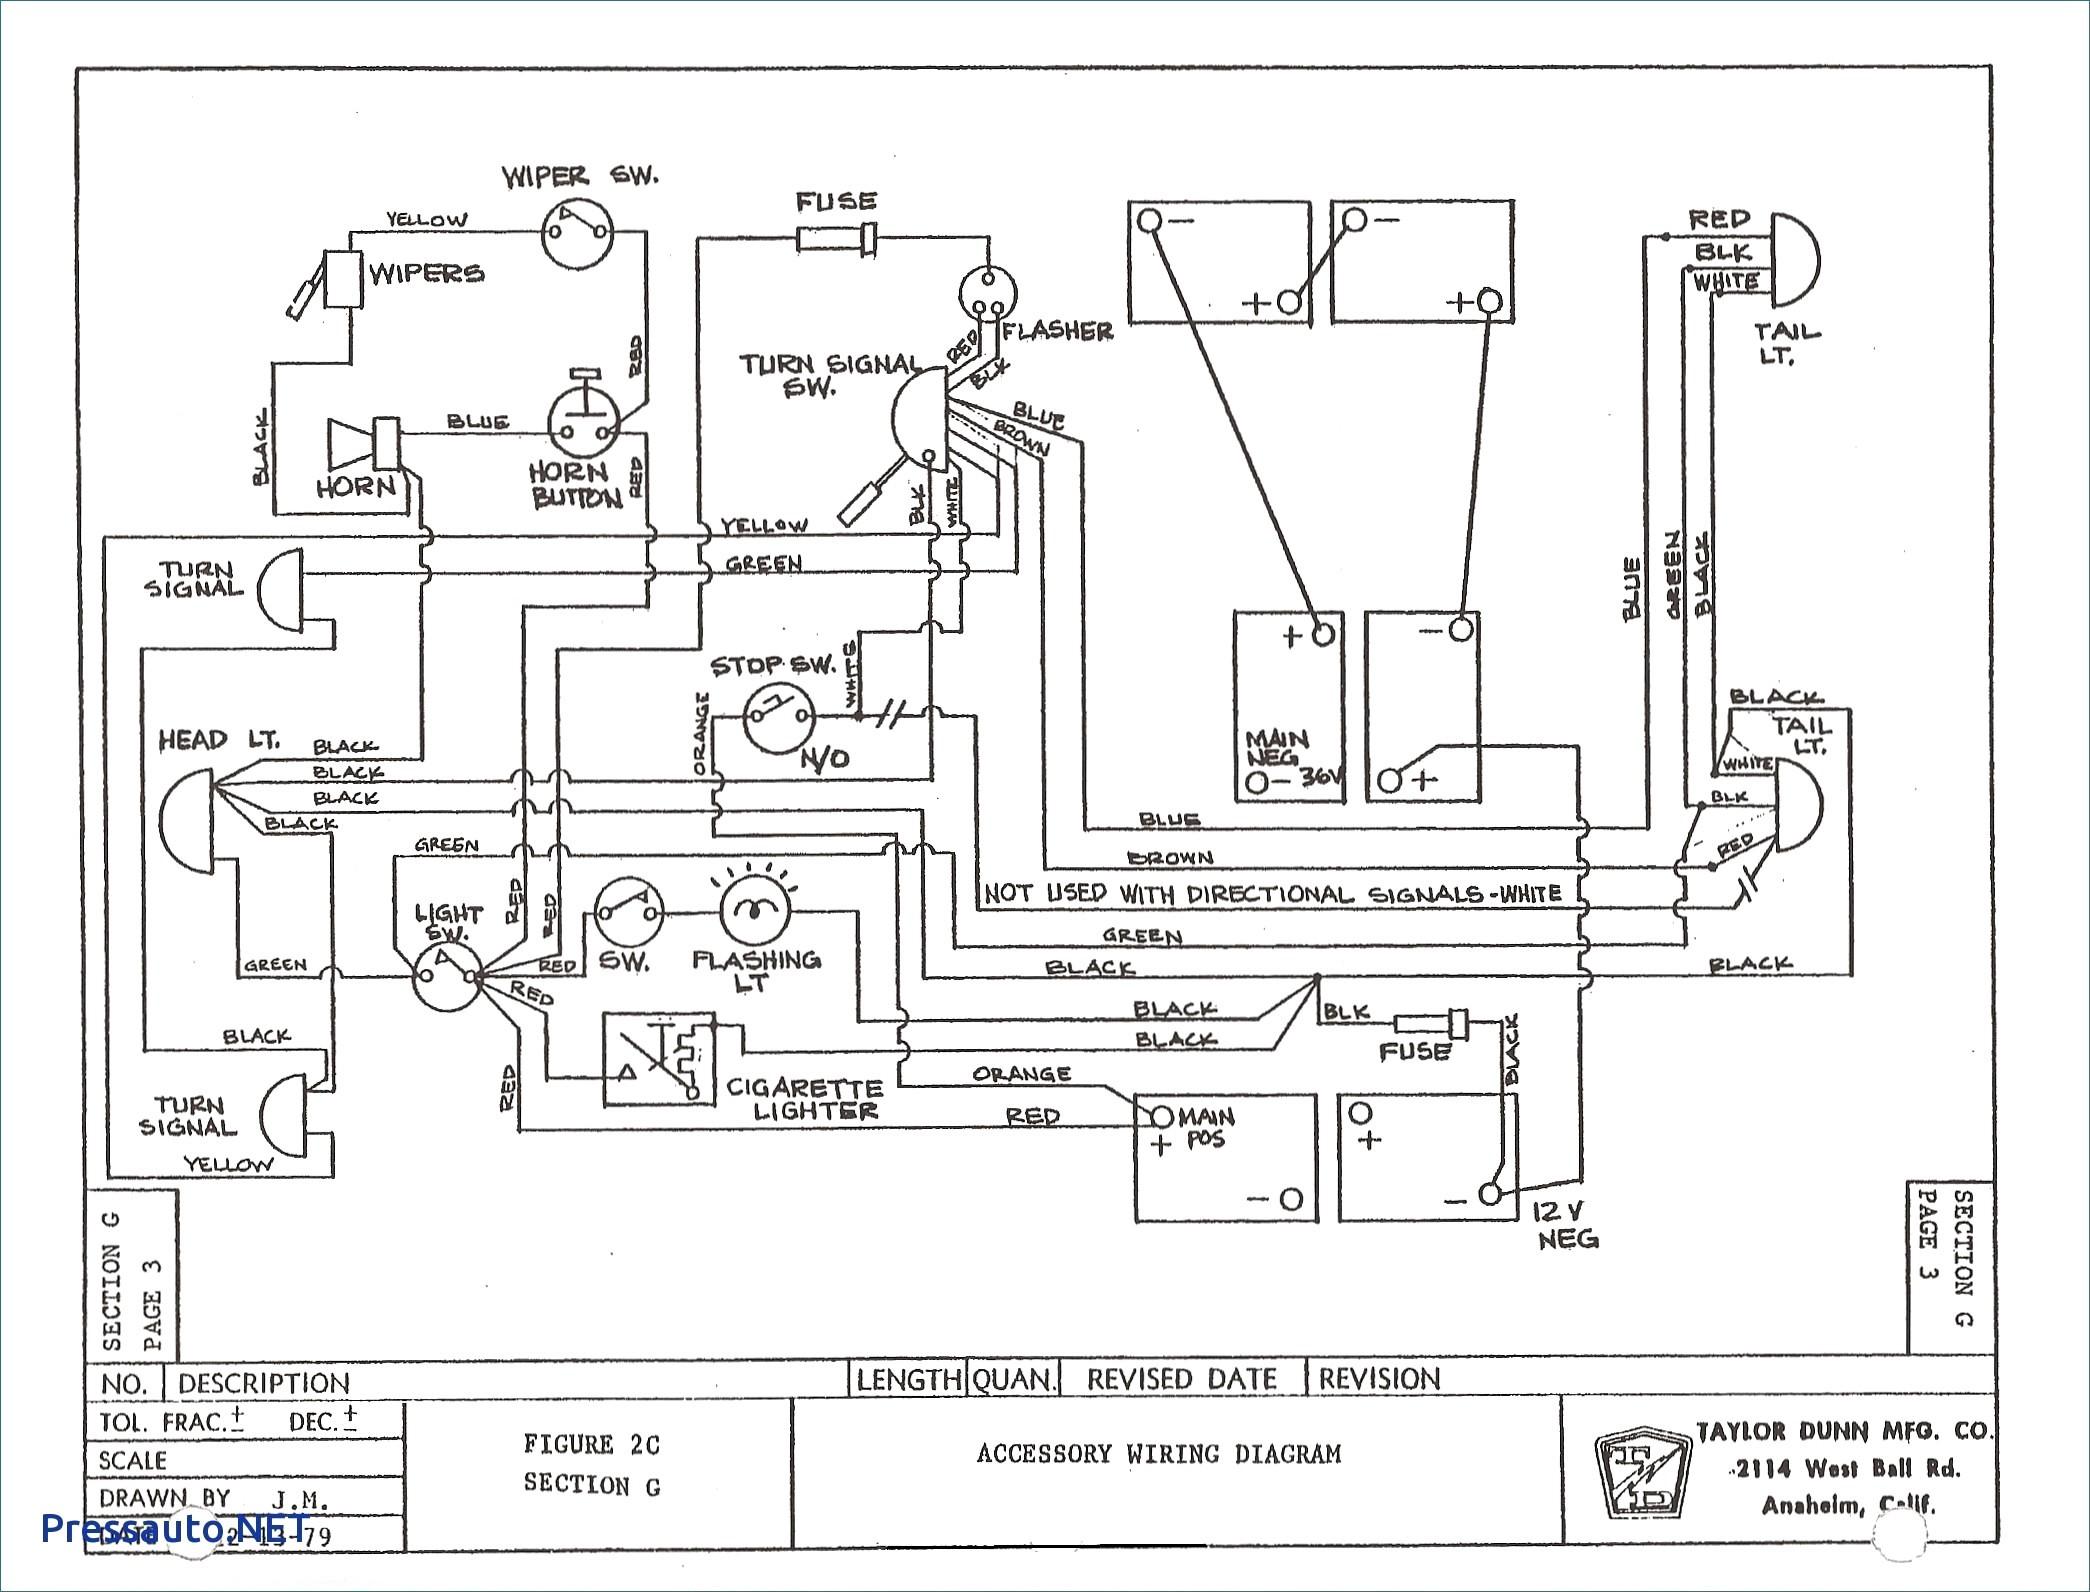 Parts Diagram for Club Car Club Car Wiring Diagram 36 Volt